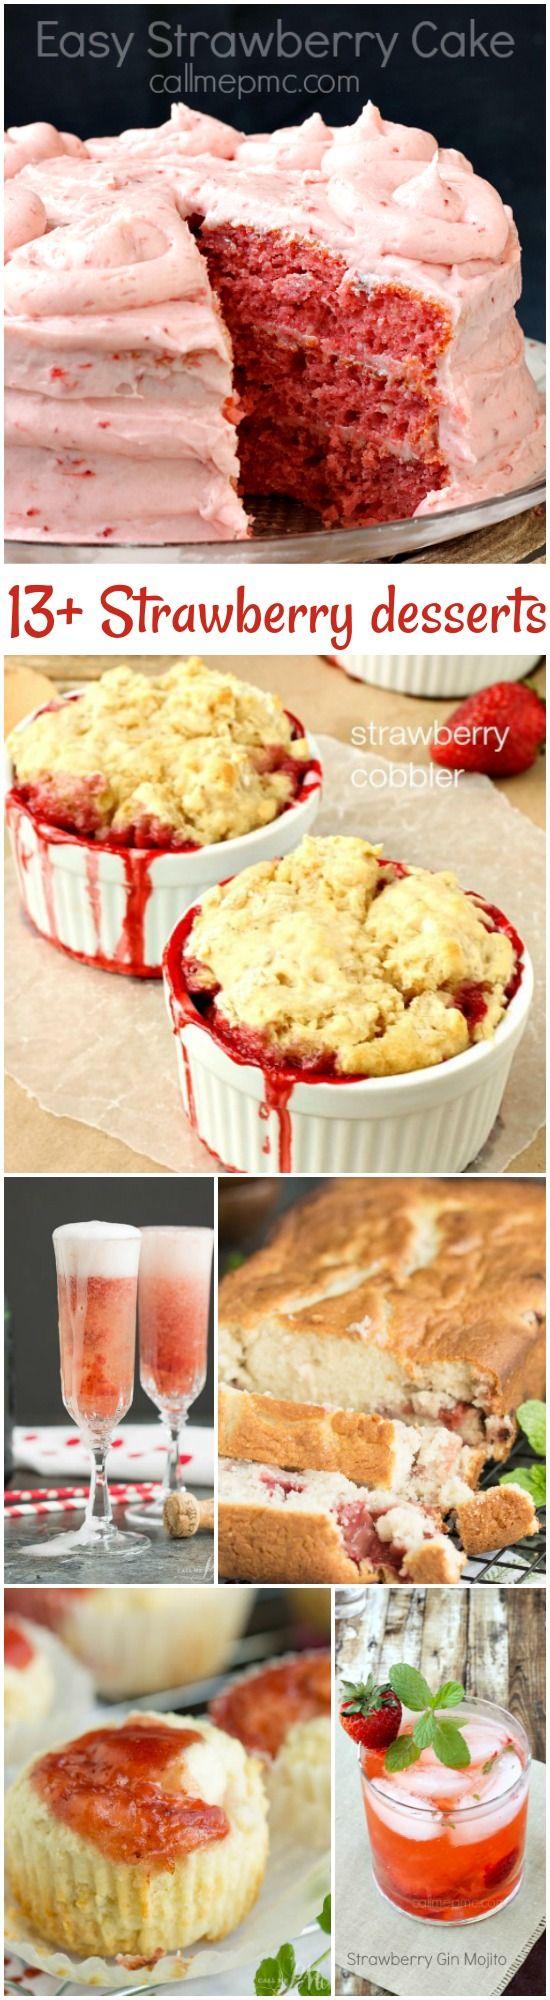 13+ Strawberry Desserts